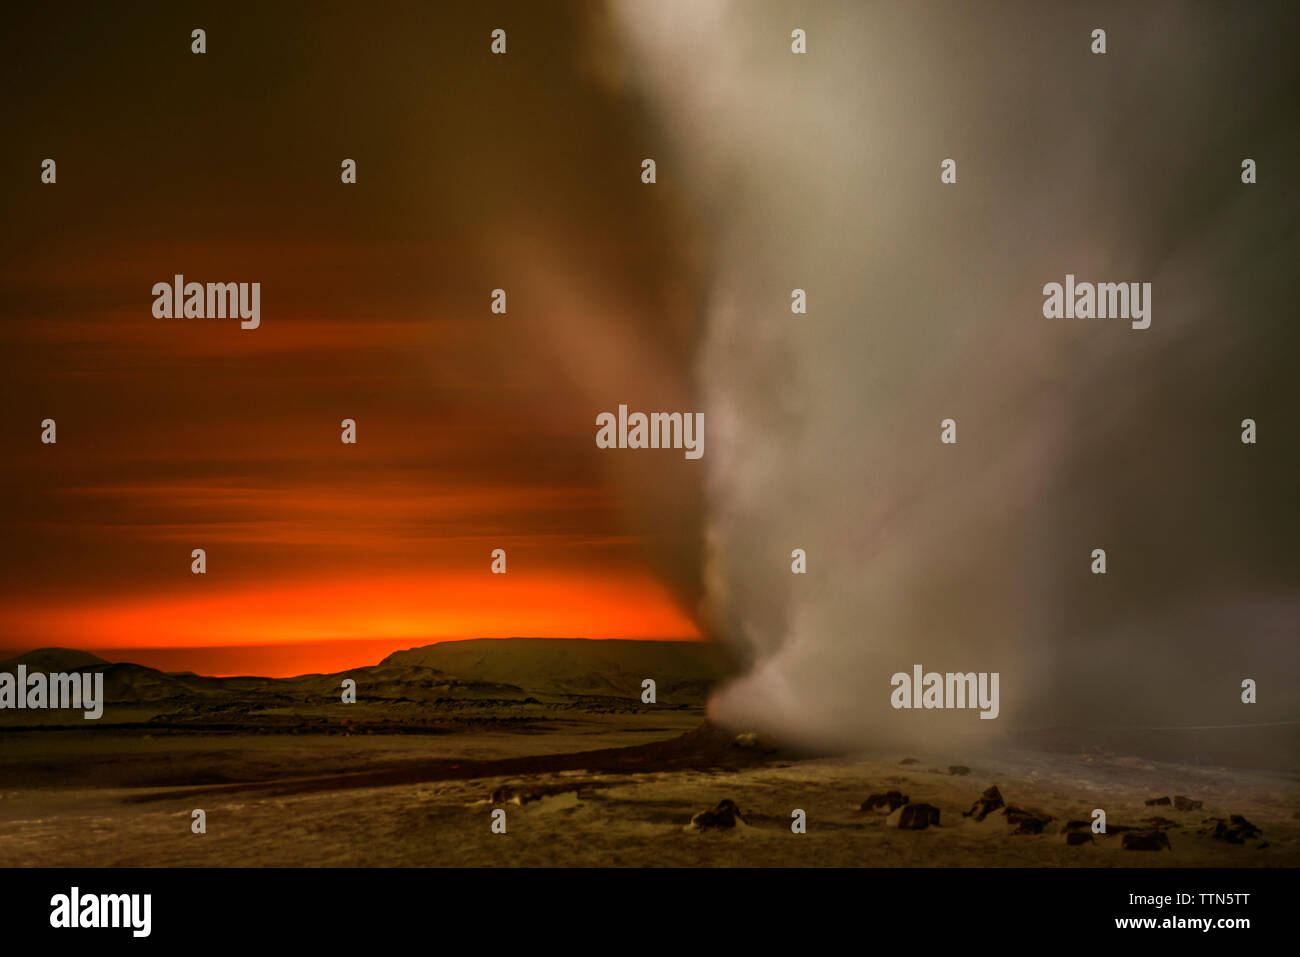 Fumaroles emitting steam during sunrise - Stock Image